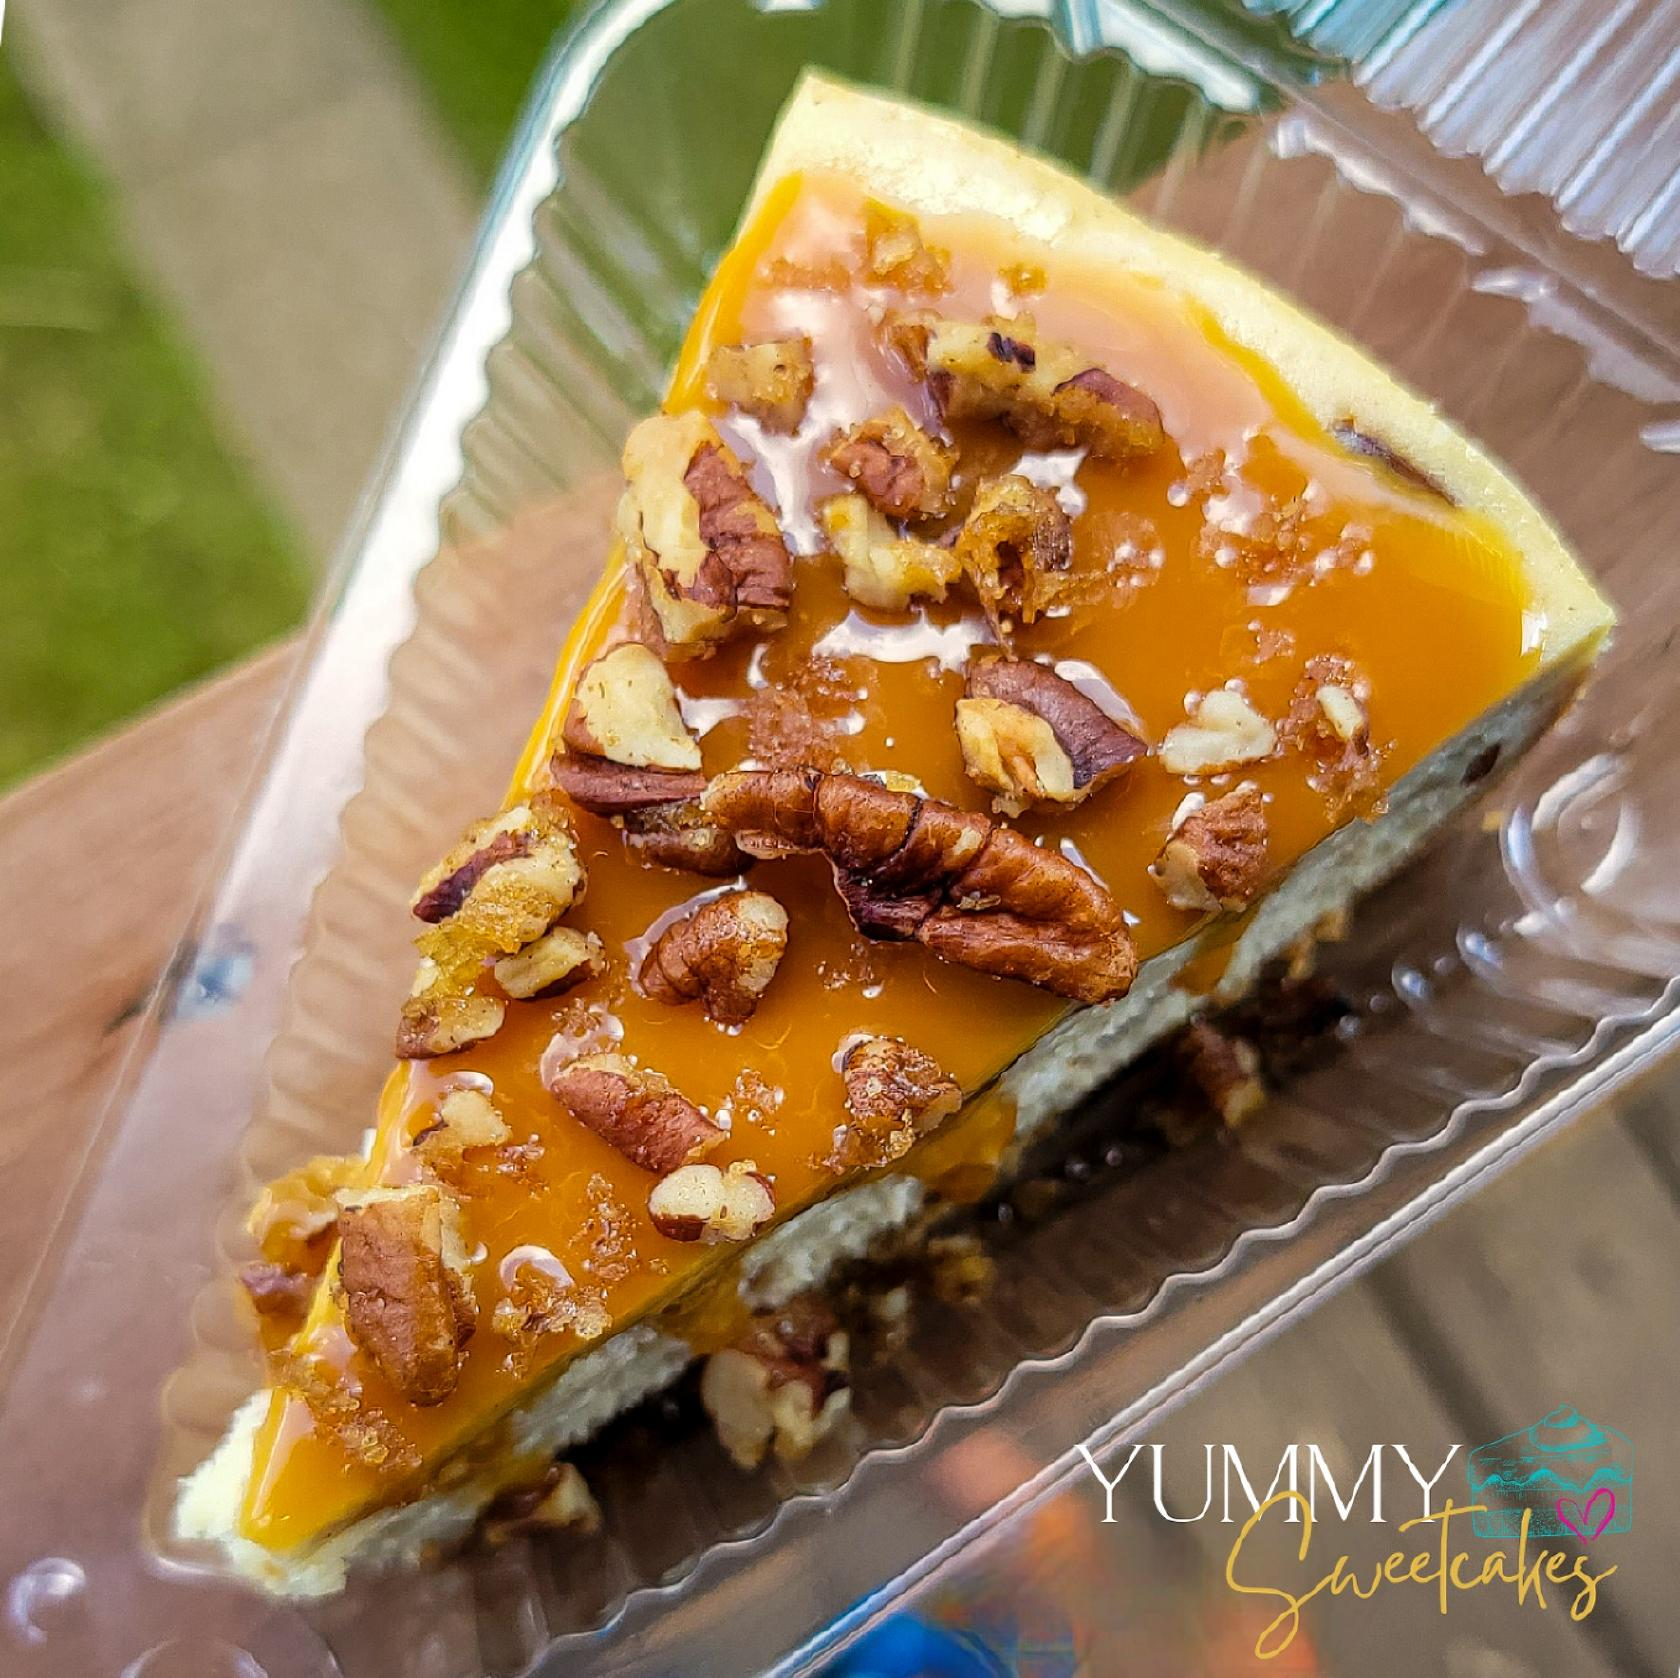 Yummy Sweetcakes photo